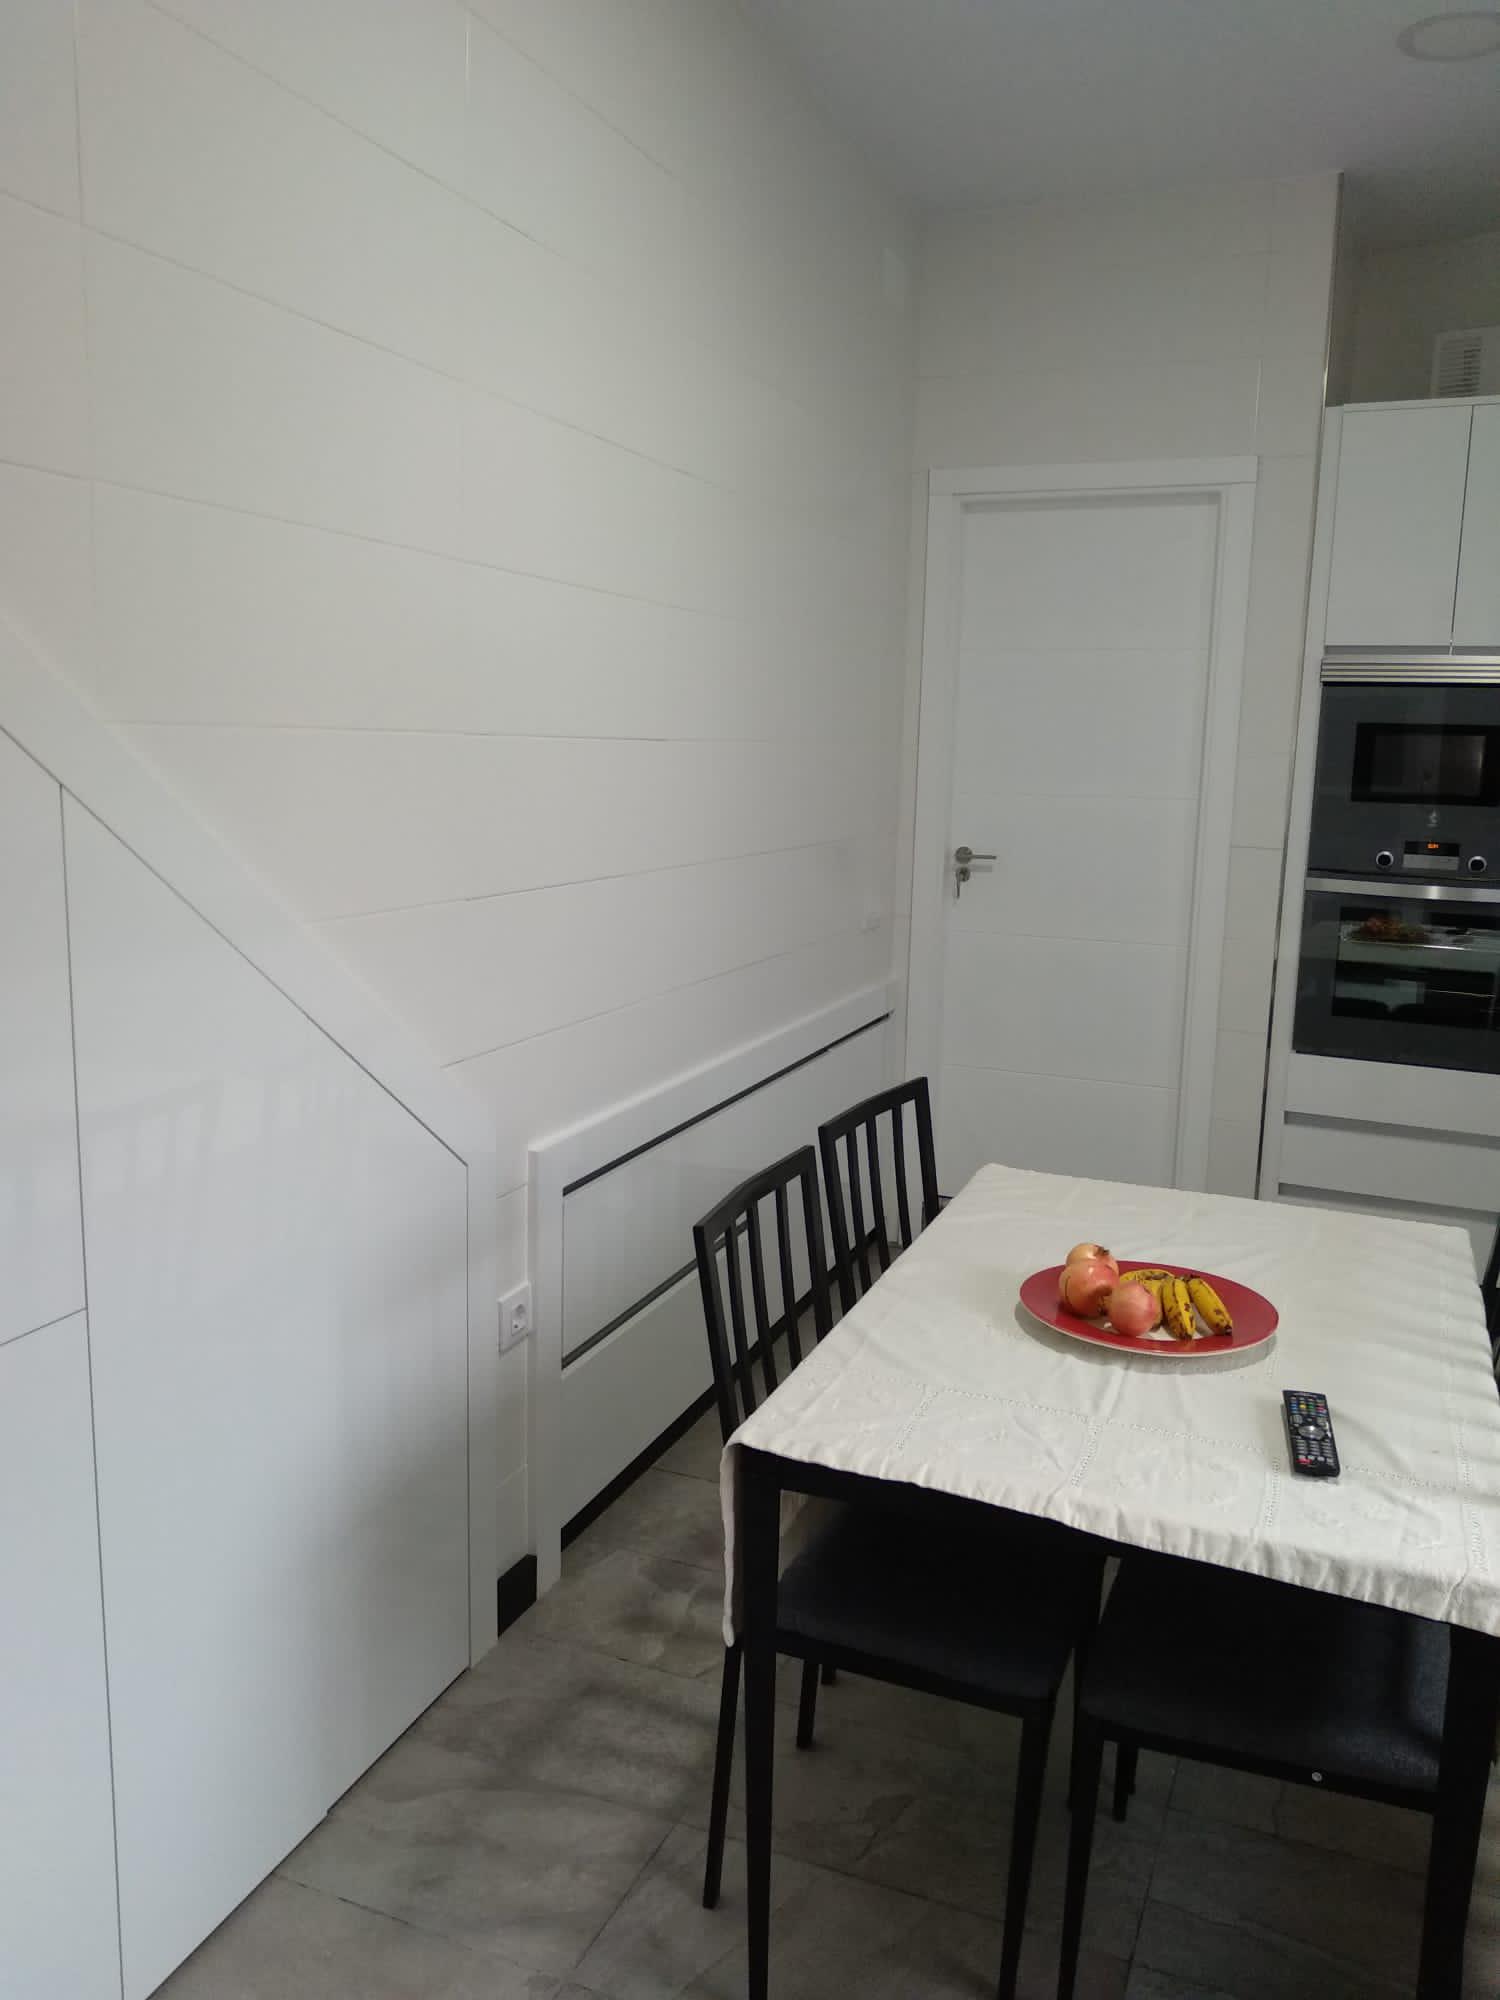 Cocina a medida con extra de espacio